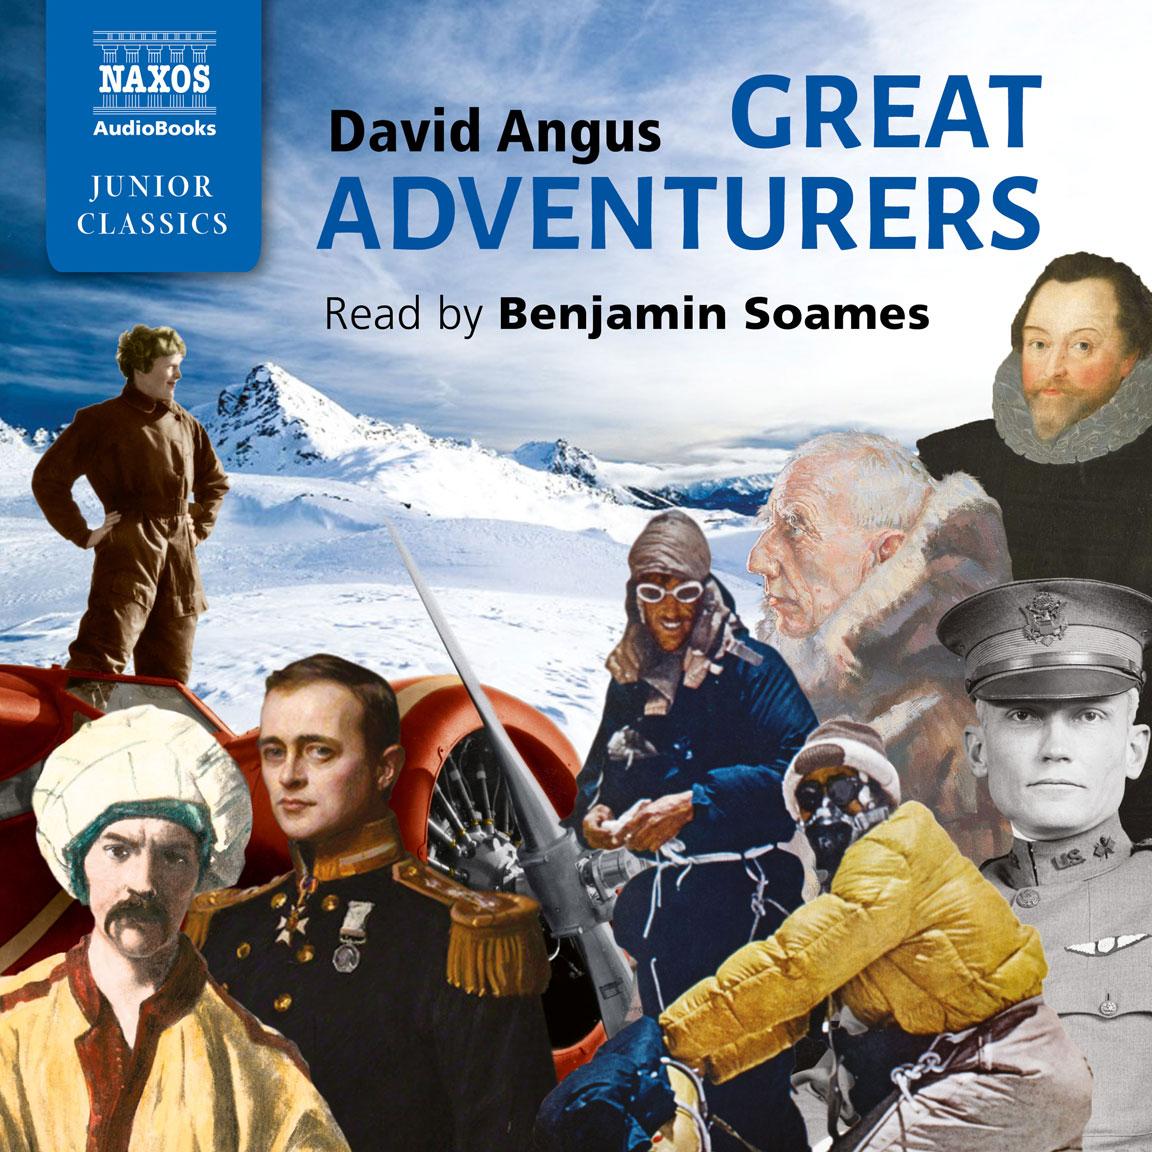 Great Adventurers (unabridged)